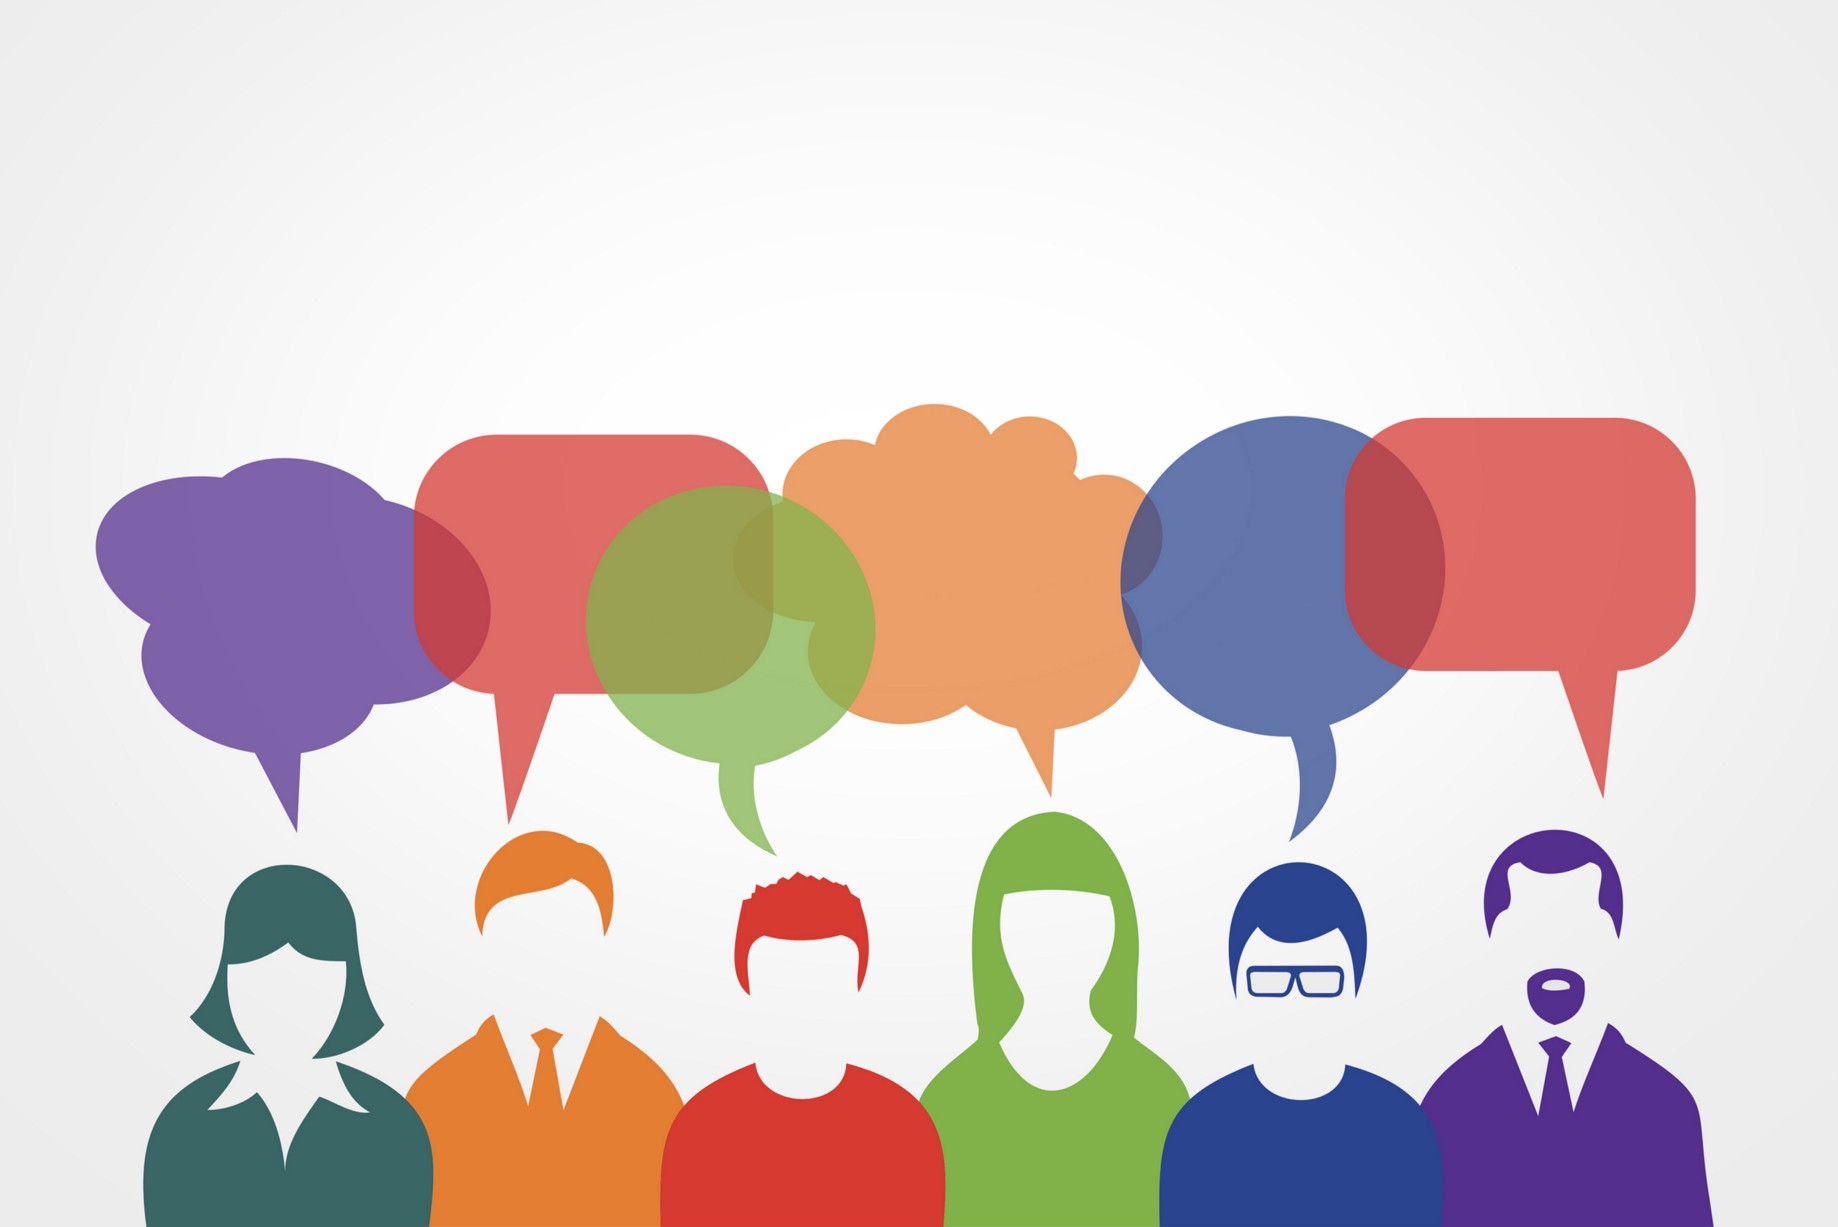 TEFL Online Pro Review vs MyTEFL vs ESLinsider